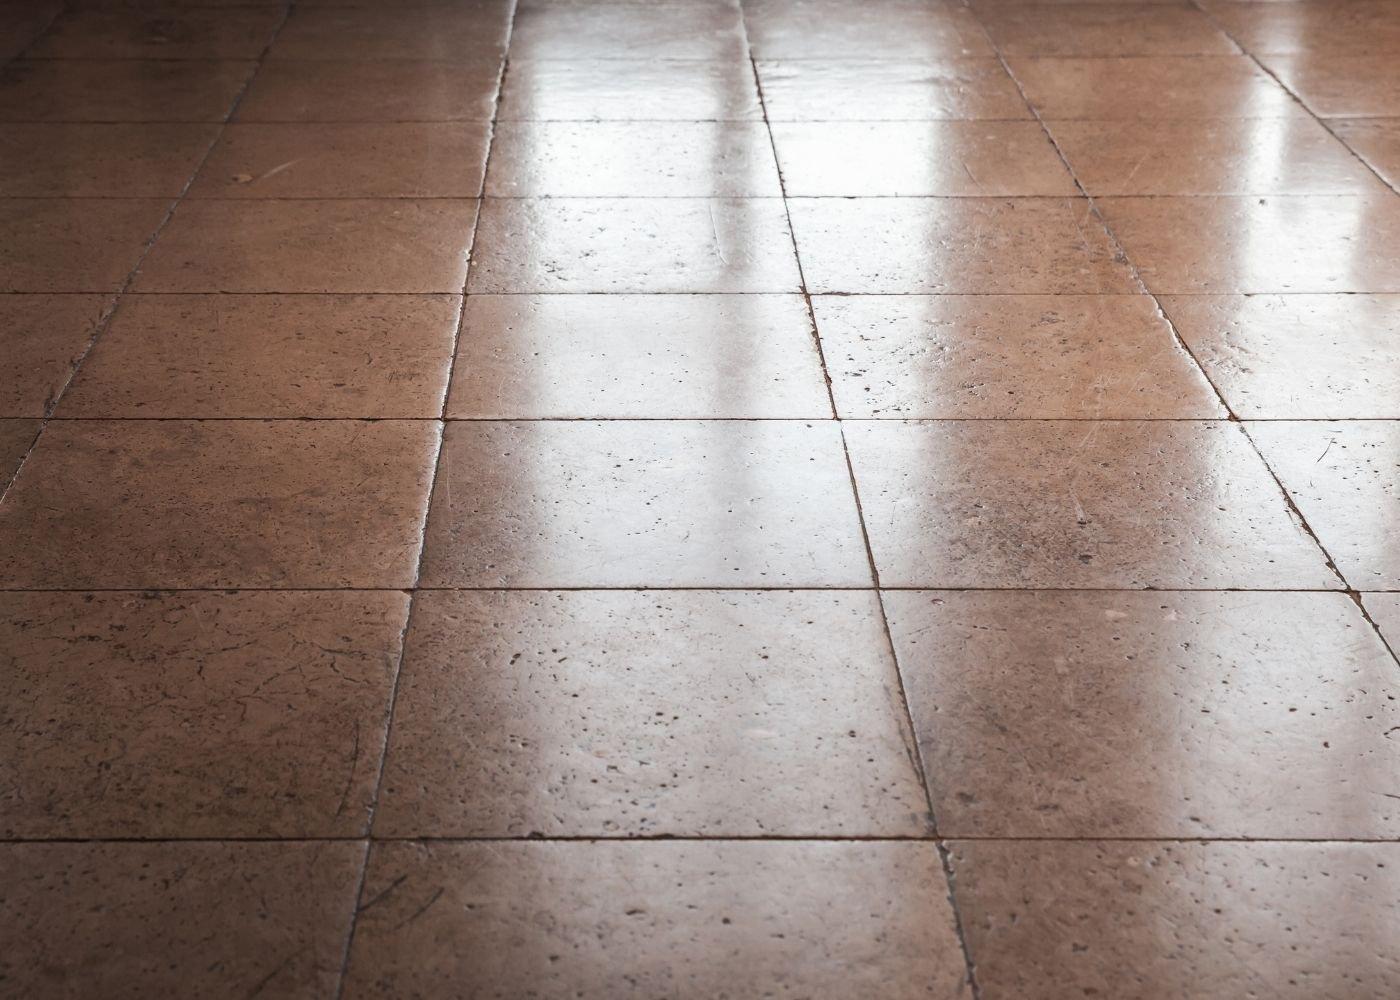 Shiny-Floors-Tiles